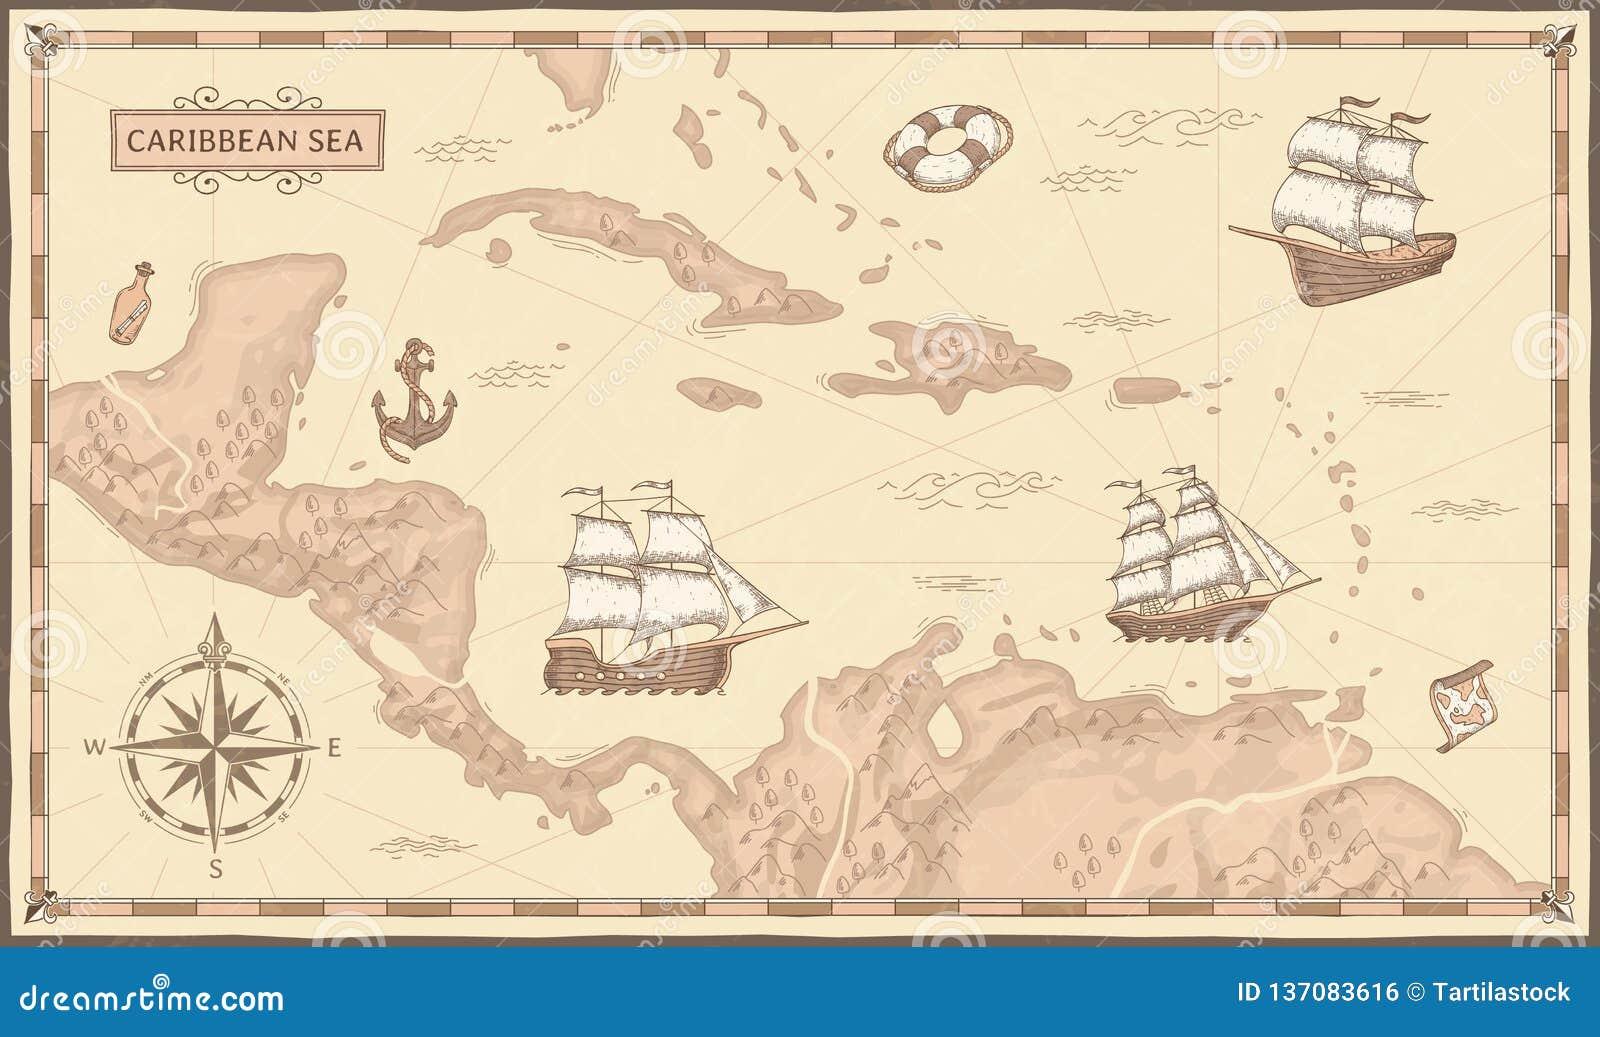 Old Caribbean Sea Map. Ancient Pirate Routes, Fantasy Sea Pirates ...